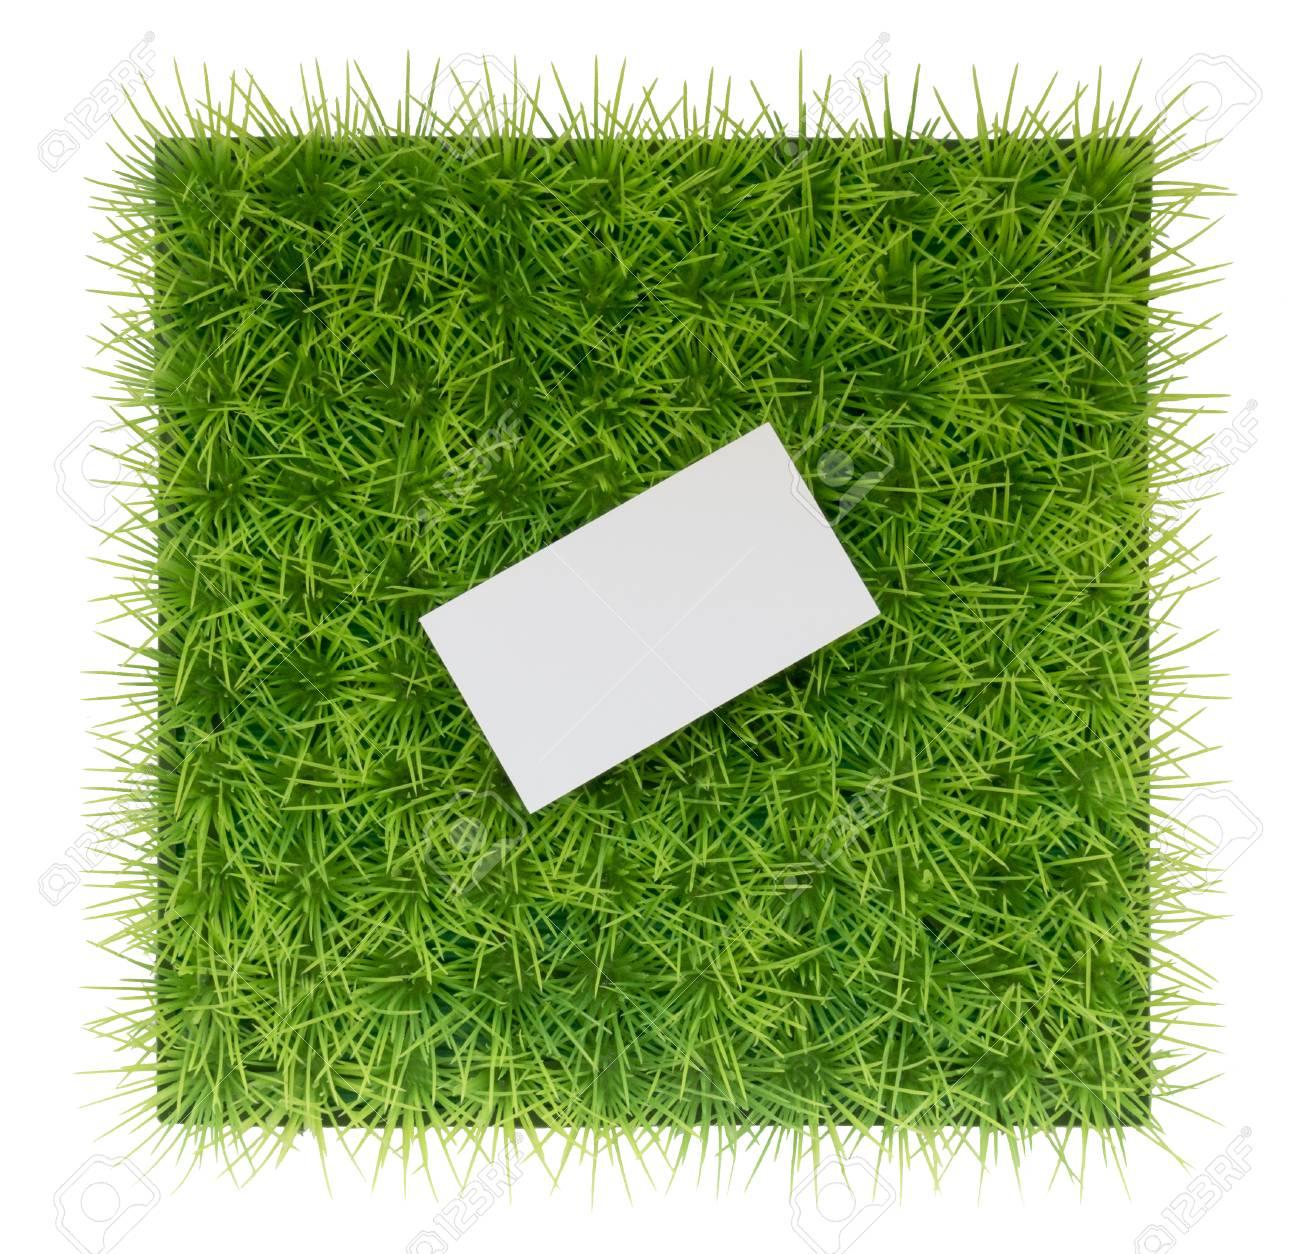 Fond Vert Naturel Avec De Lherbe Verte Et Une Carte Visite